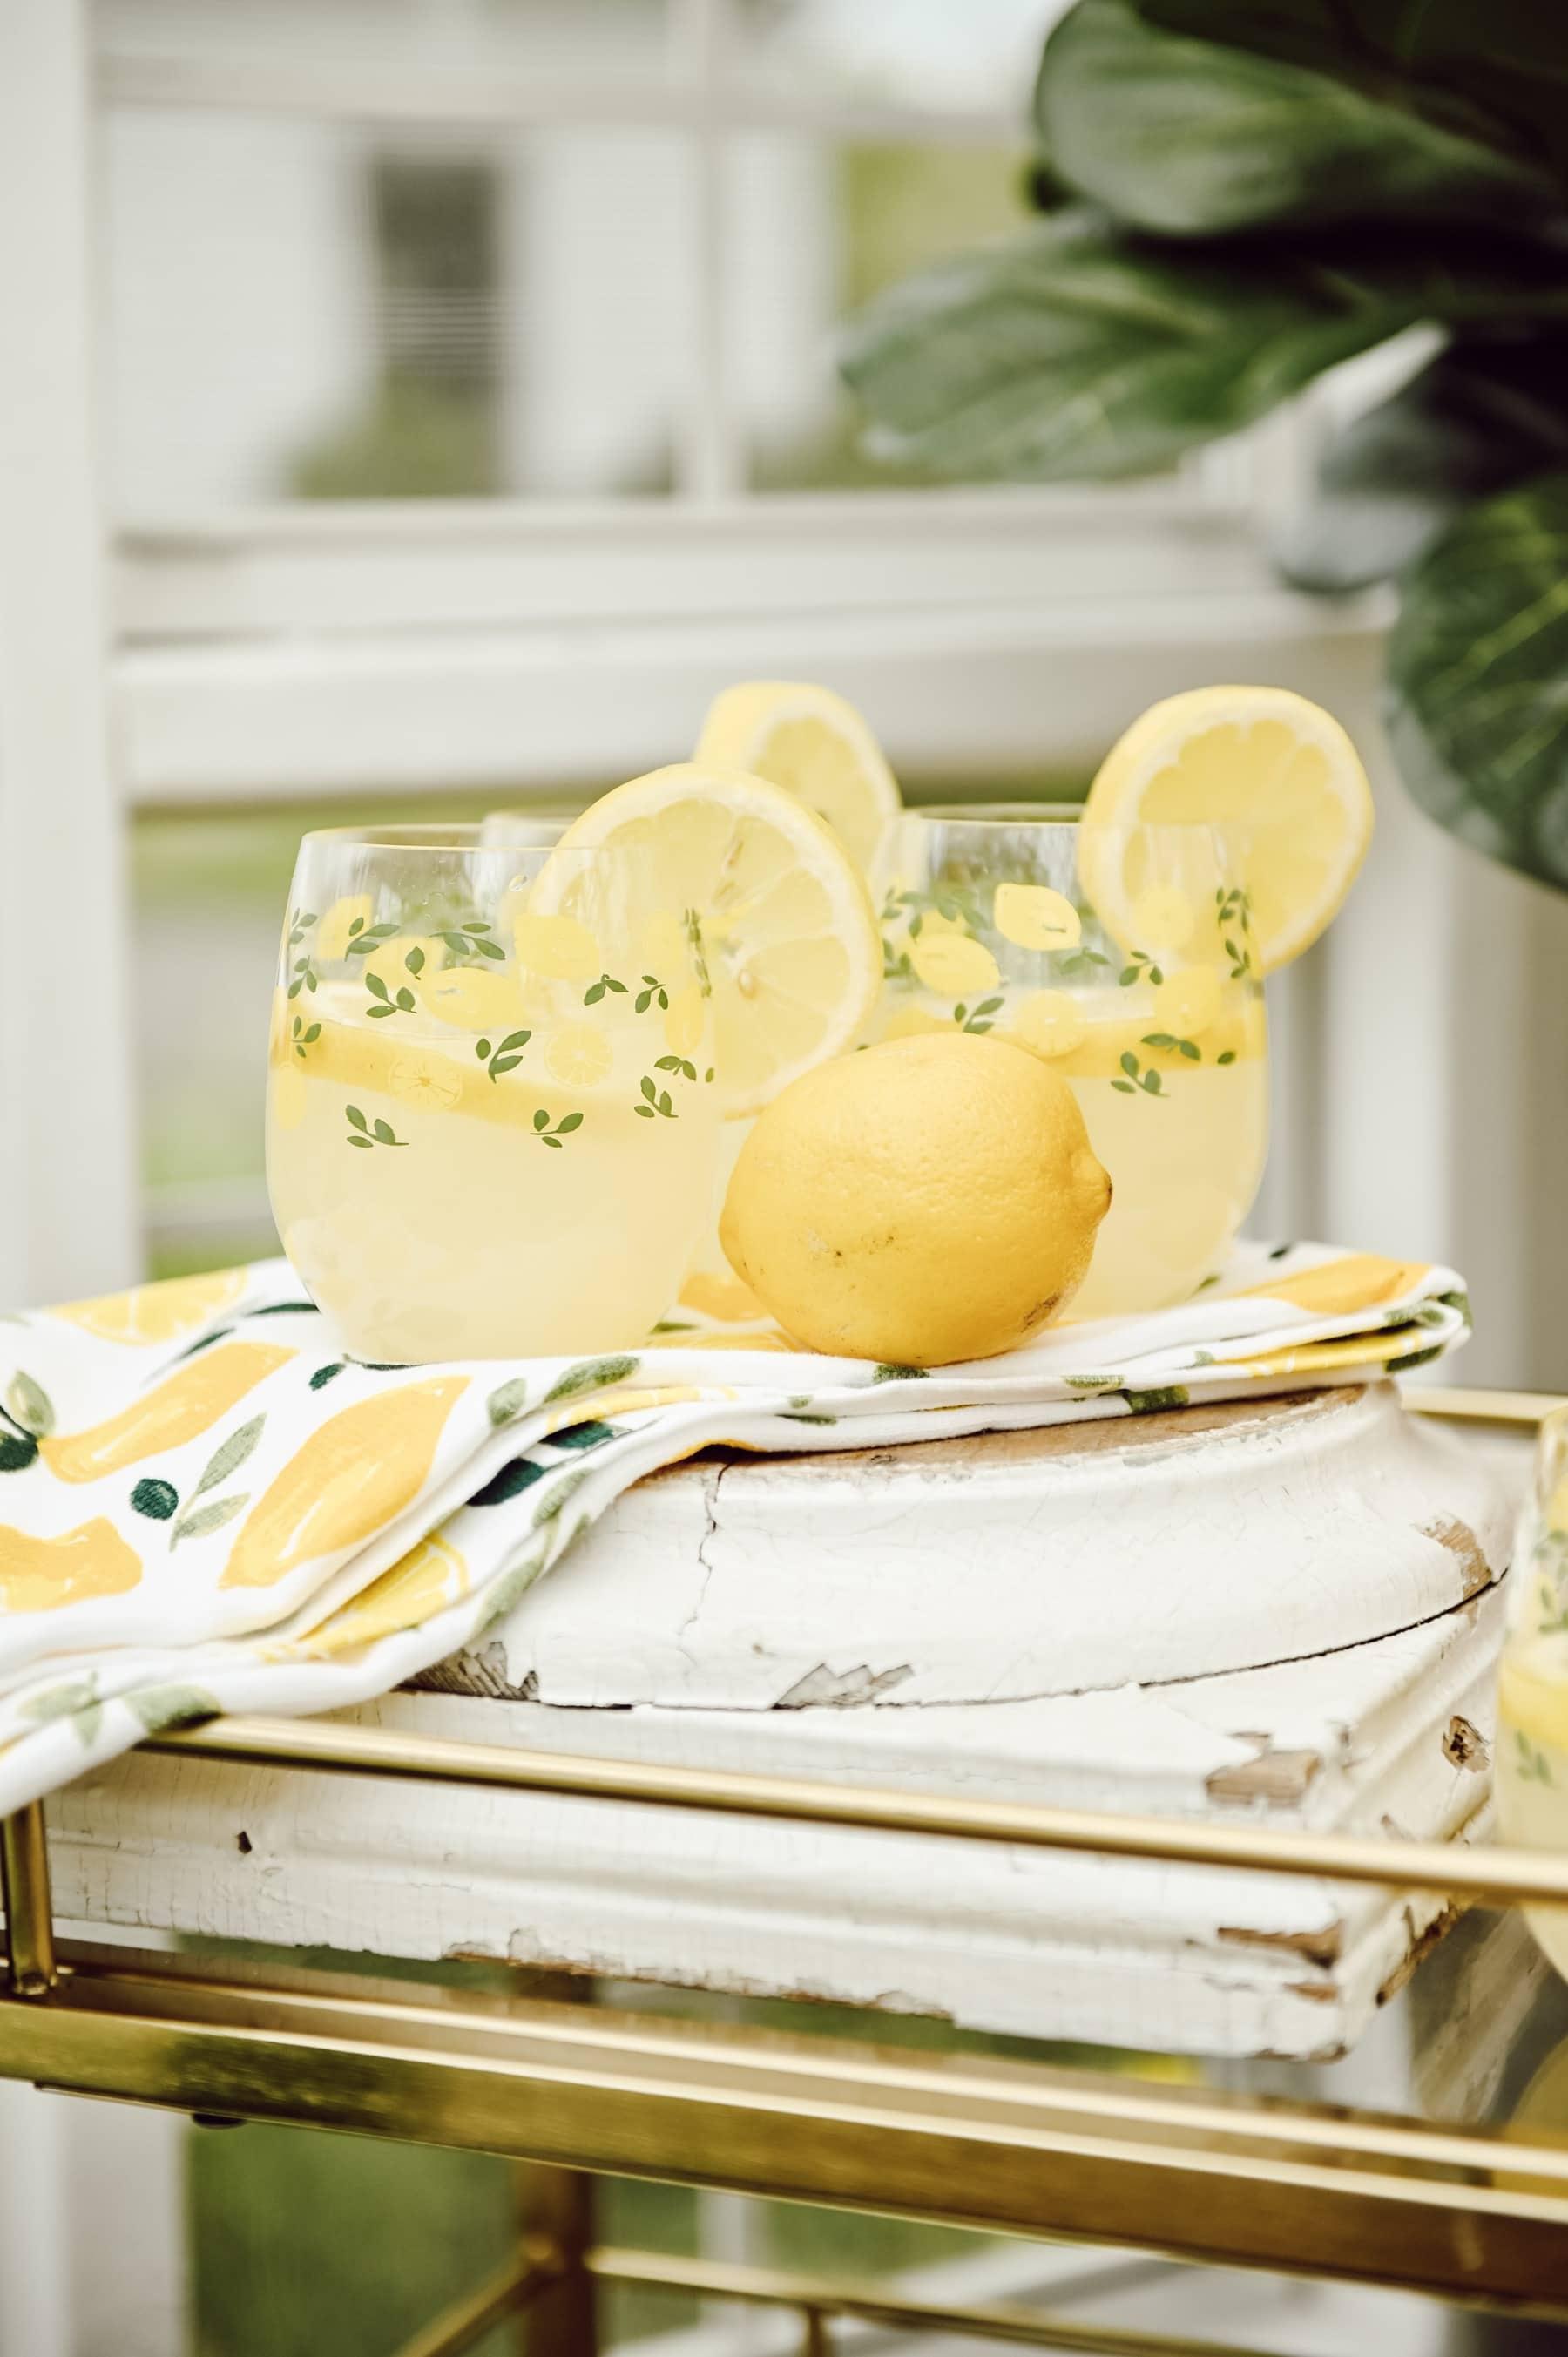 Lemon Drinks in greenhouse